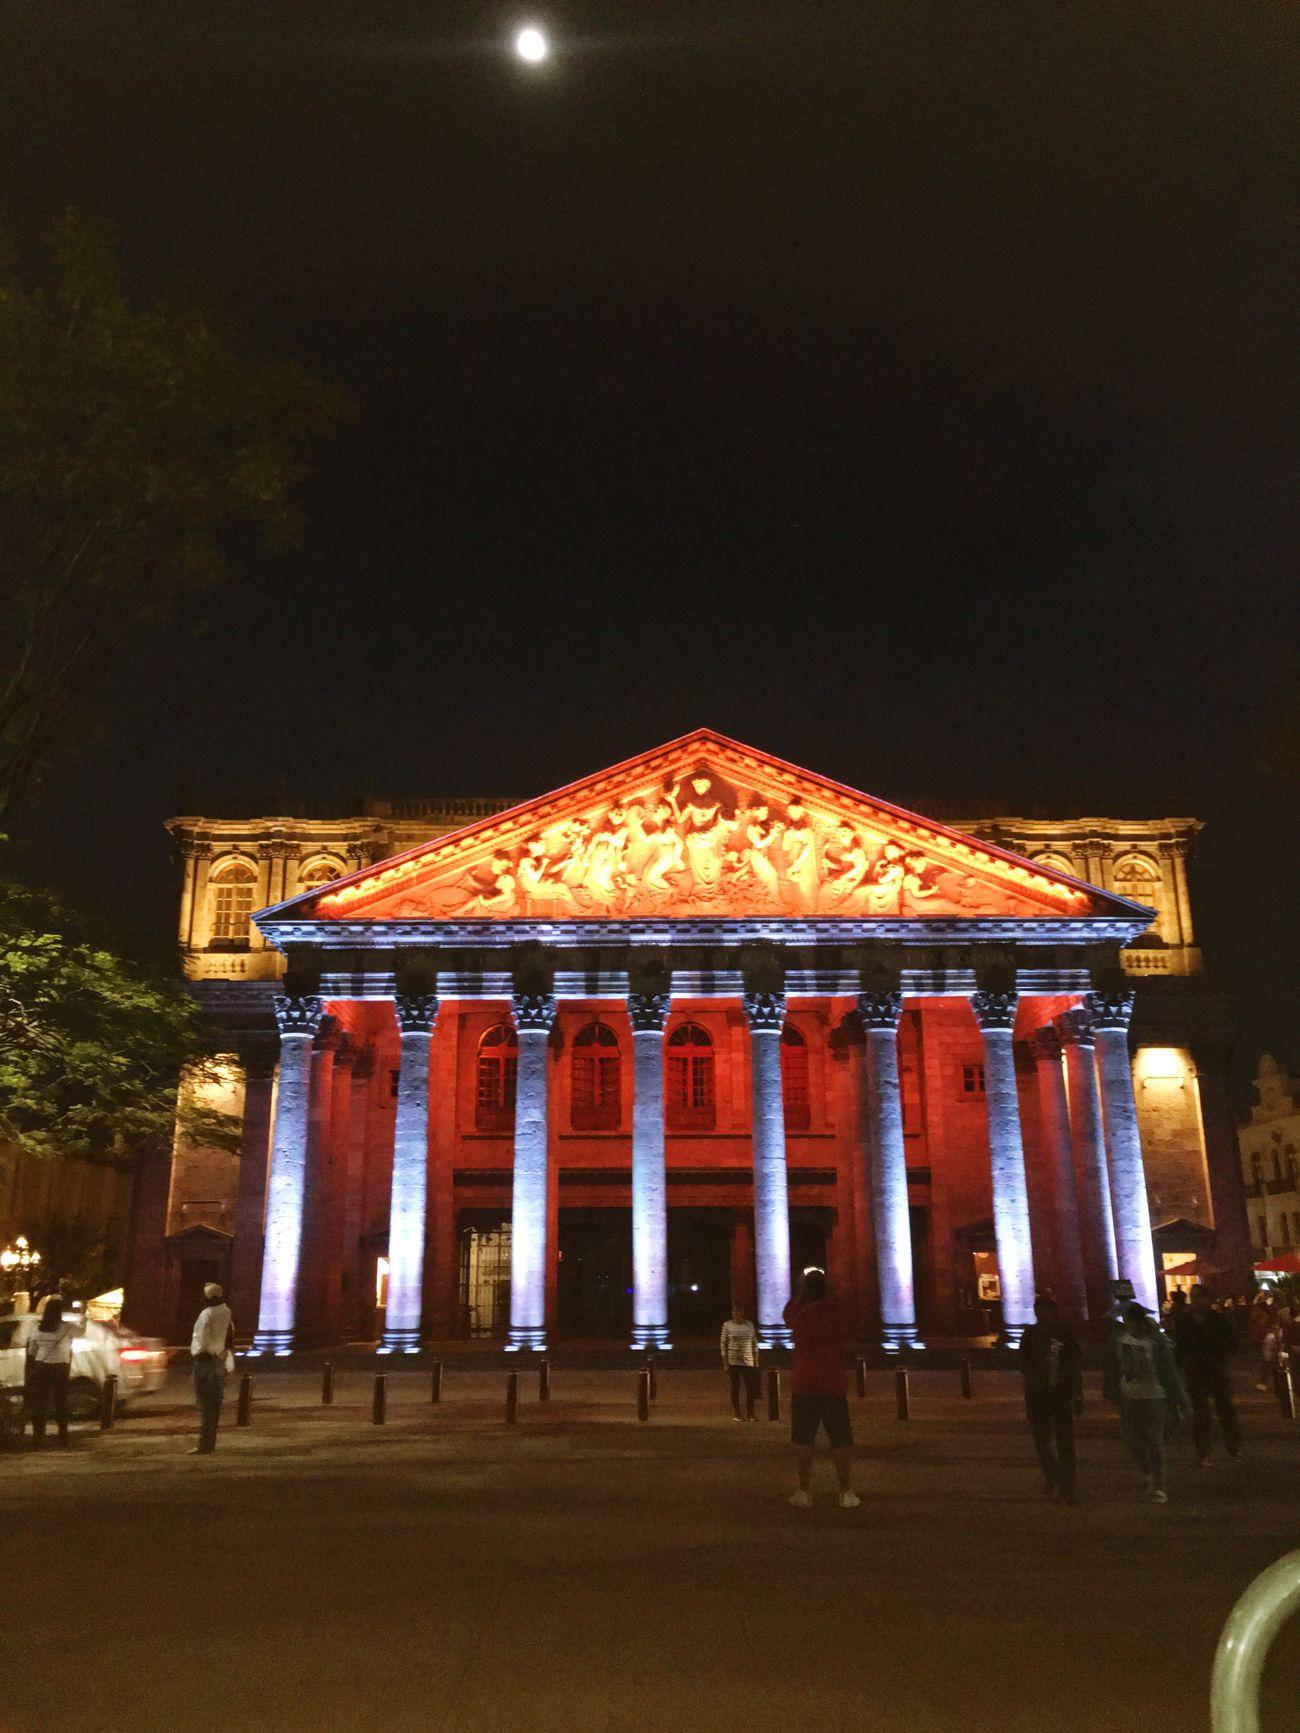 Que nunca llegue el rumor de la discordia Night Travel Destinations Illuminated Tourism Architecture Built Structure City Building Exterior Sky Disfrutando De La Vida Teatrodegollado